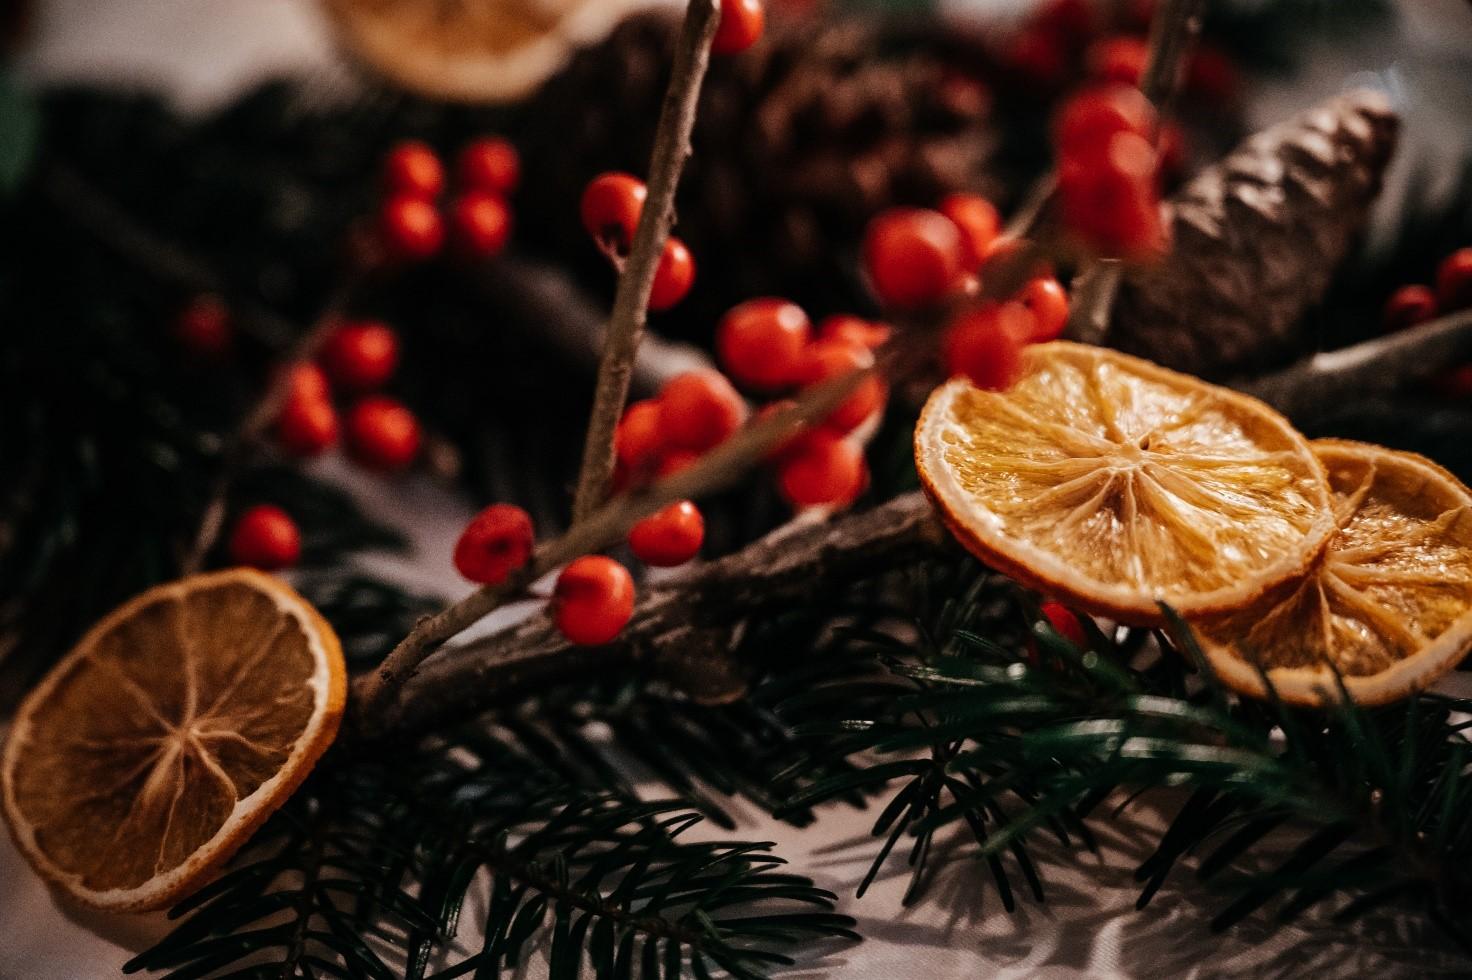 Cinnamon scent winter wedding decorations